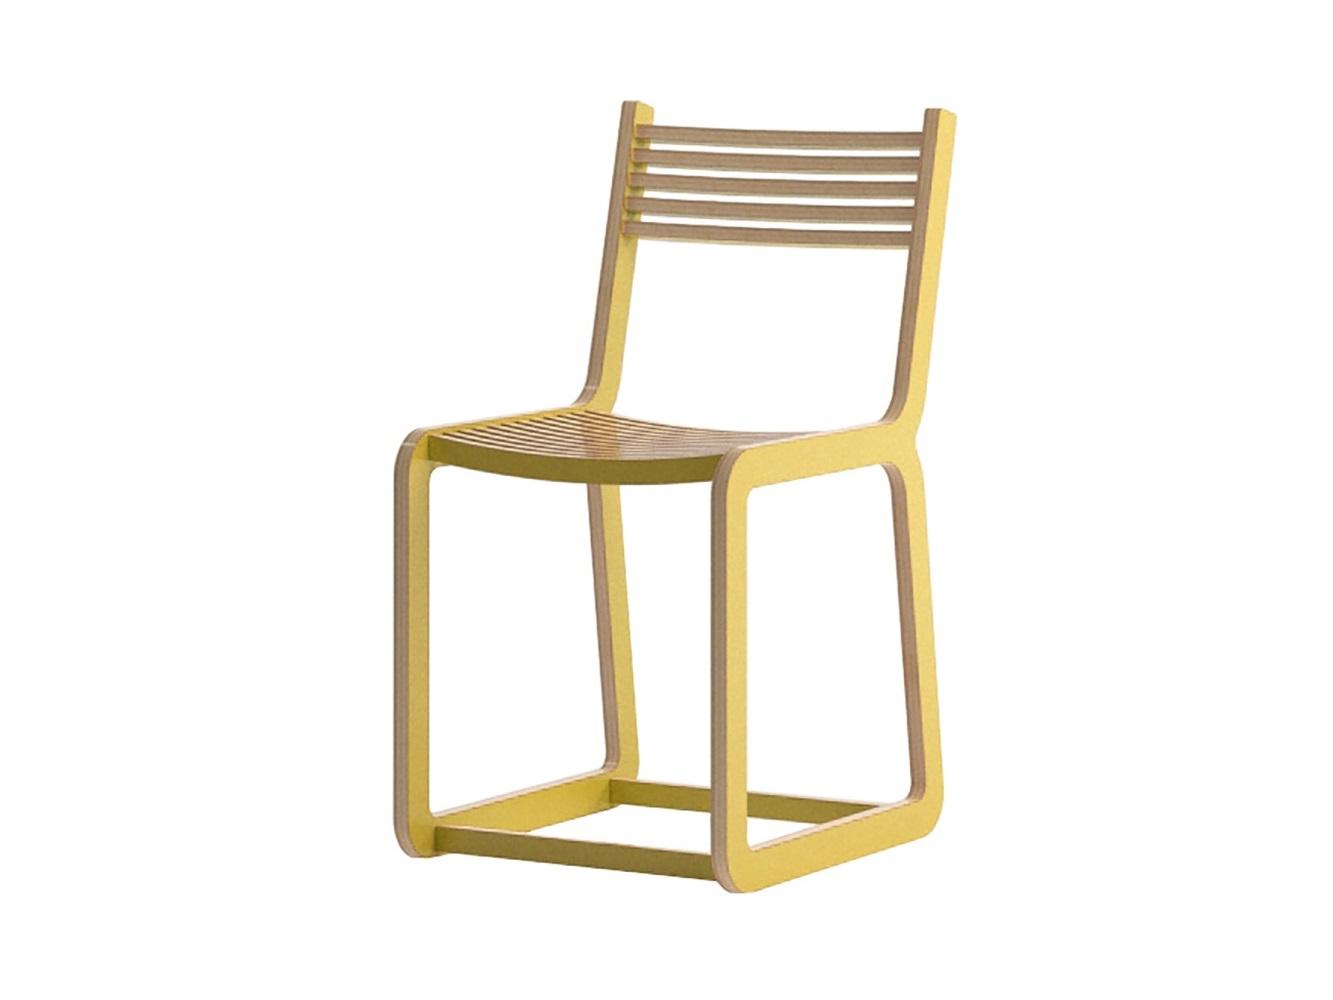 Кухонный стул Studiola 15434464 от thefurnish